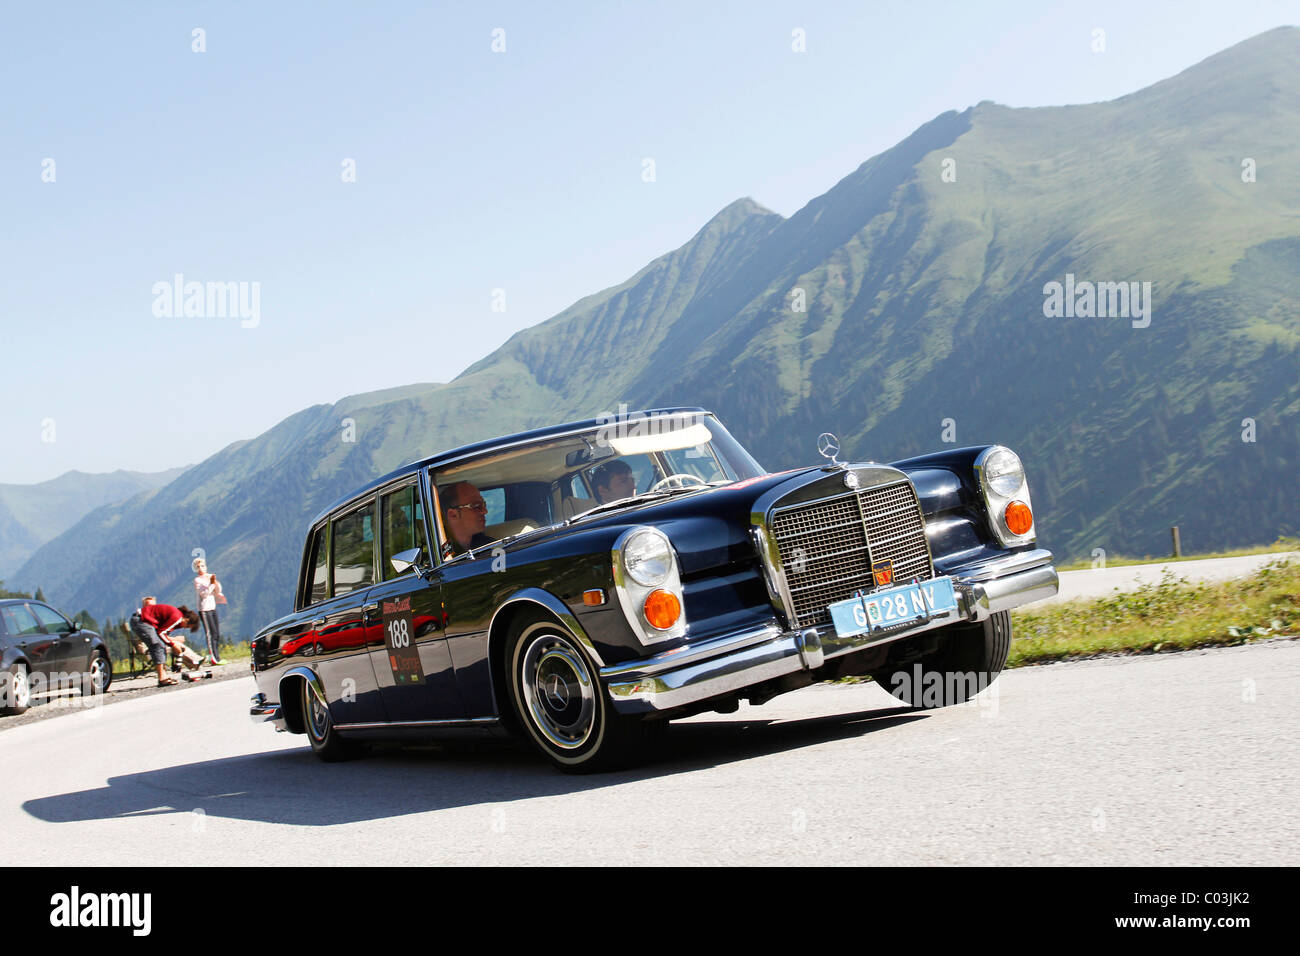 Mercedes-Benz 600 Pullman, built in 1968, Soelkpass, Ennstal Classic ...